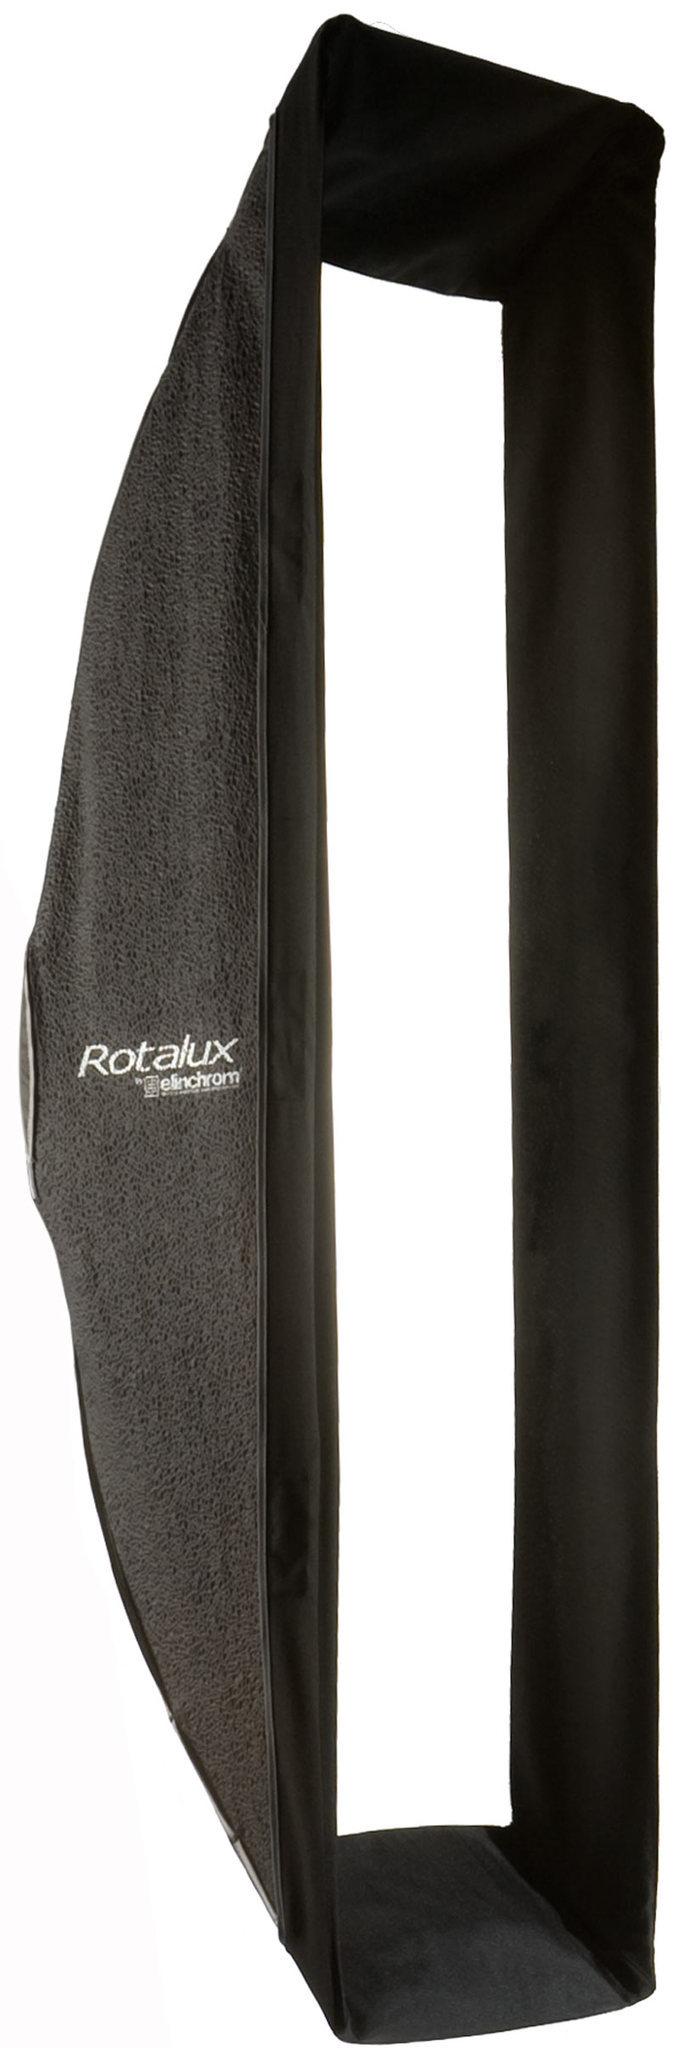 Elinchrom Rotalux Recta 50x130 см Strip